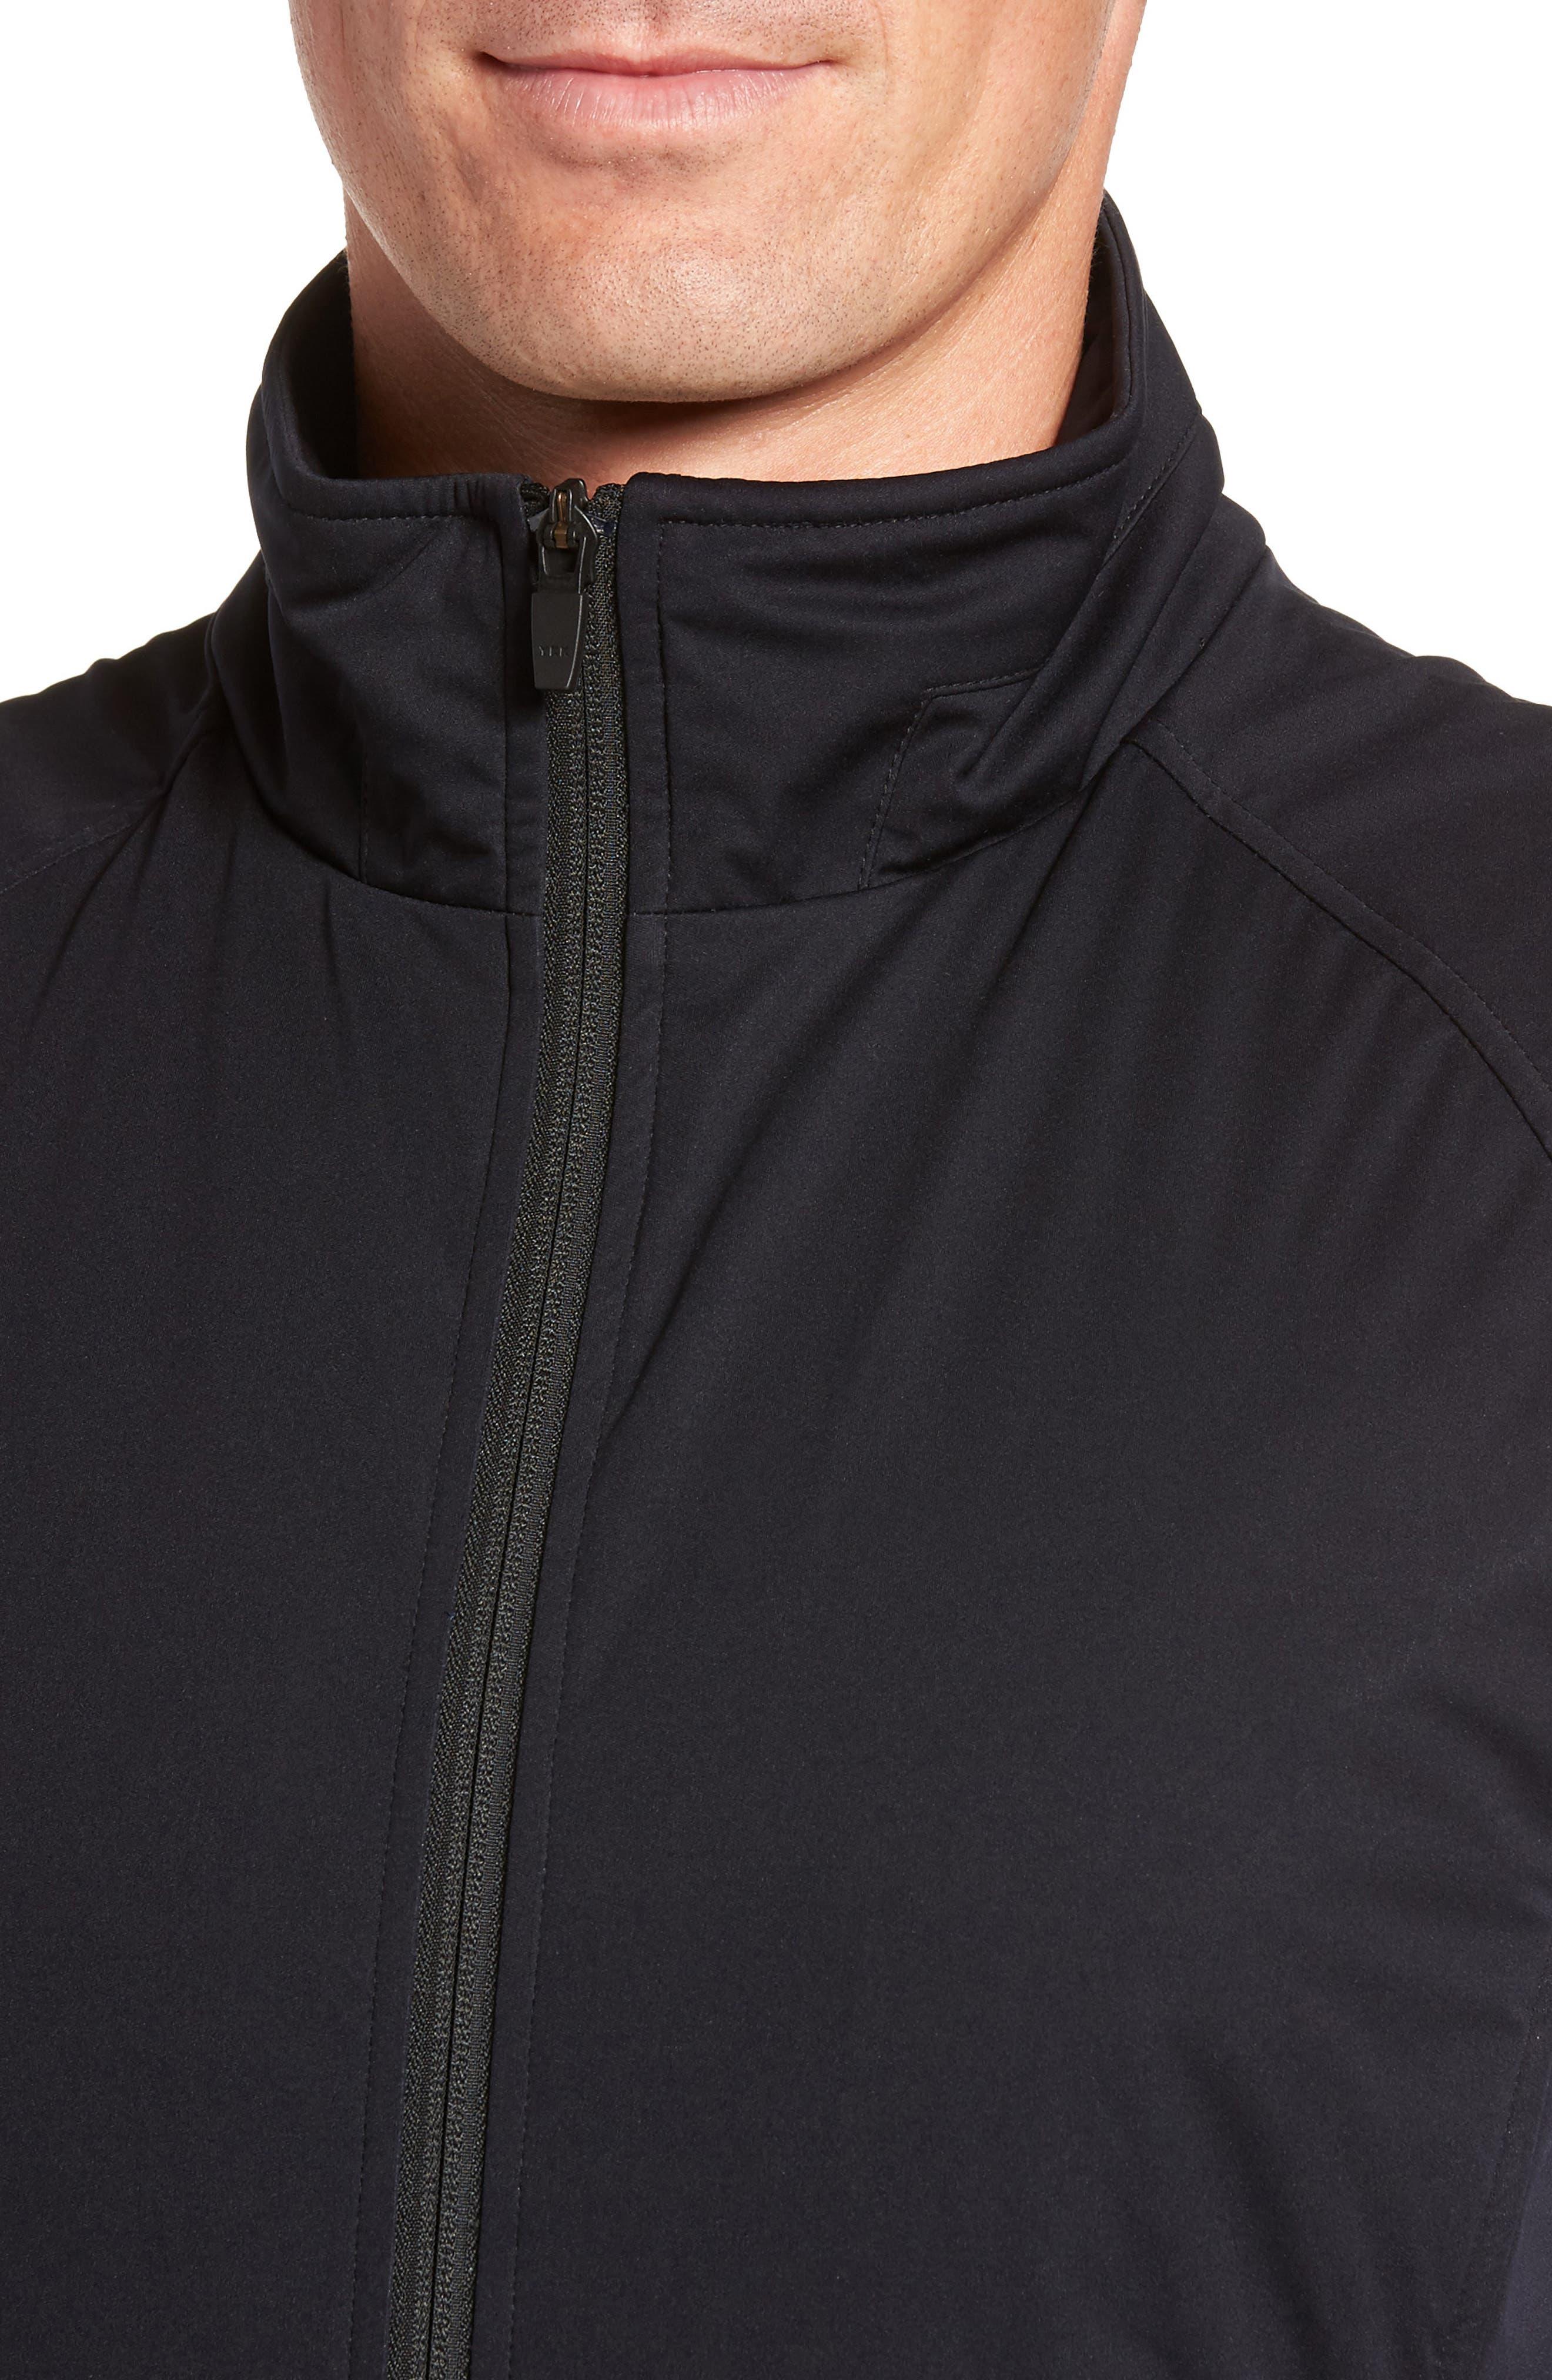 Soft Shell Zip Vest,                             Alternate thumbnail 4, color,                             001